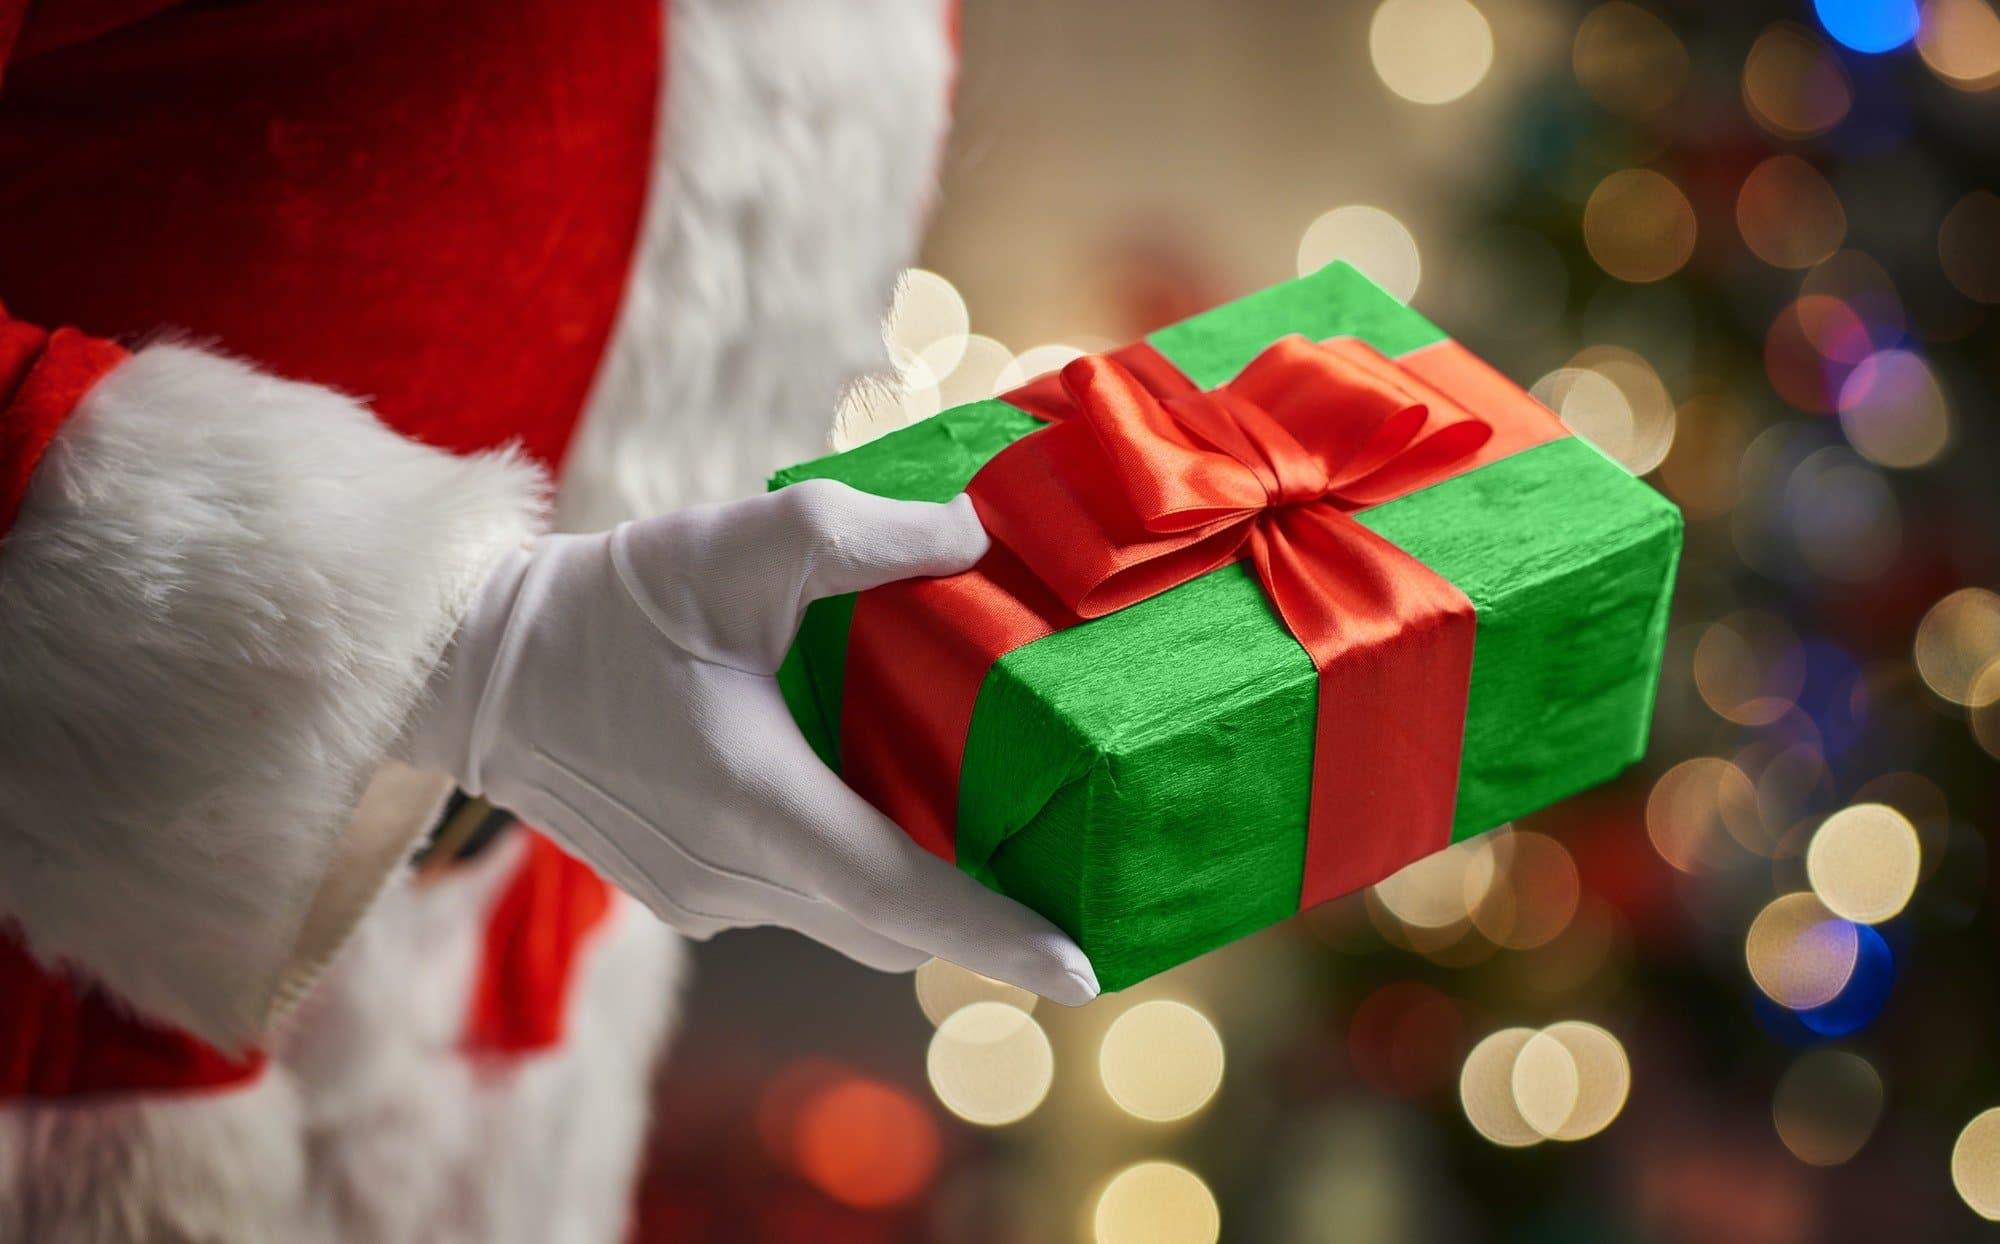 Hands of Santa Claus